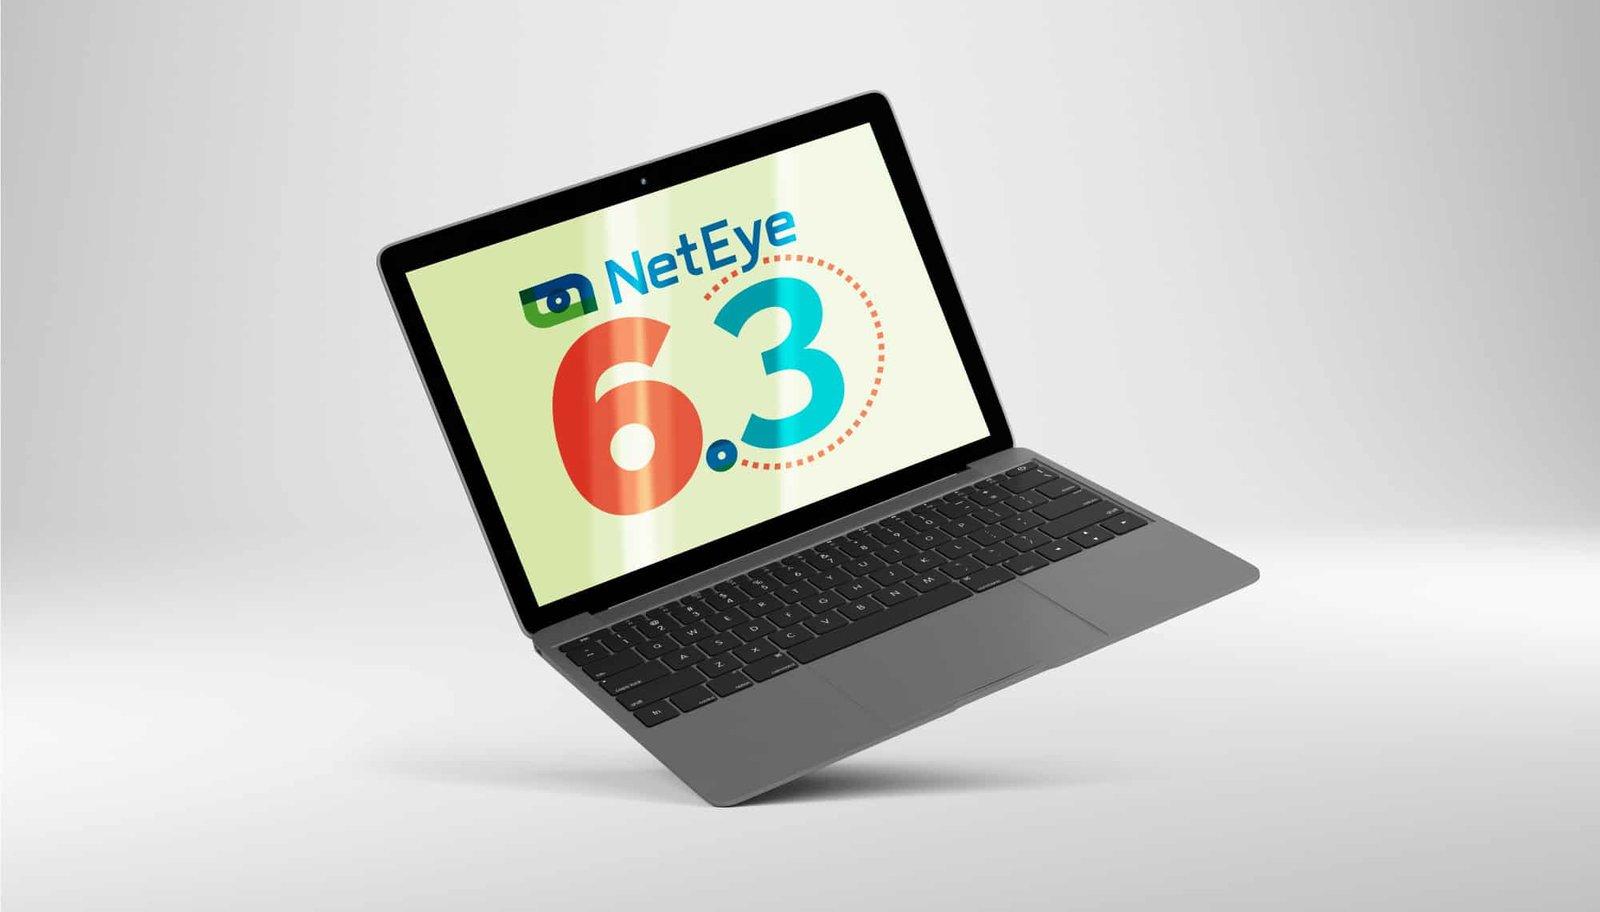 Versão 6.3 do NetEye em Notebook